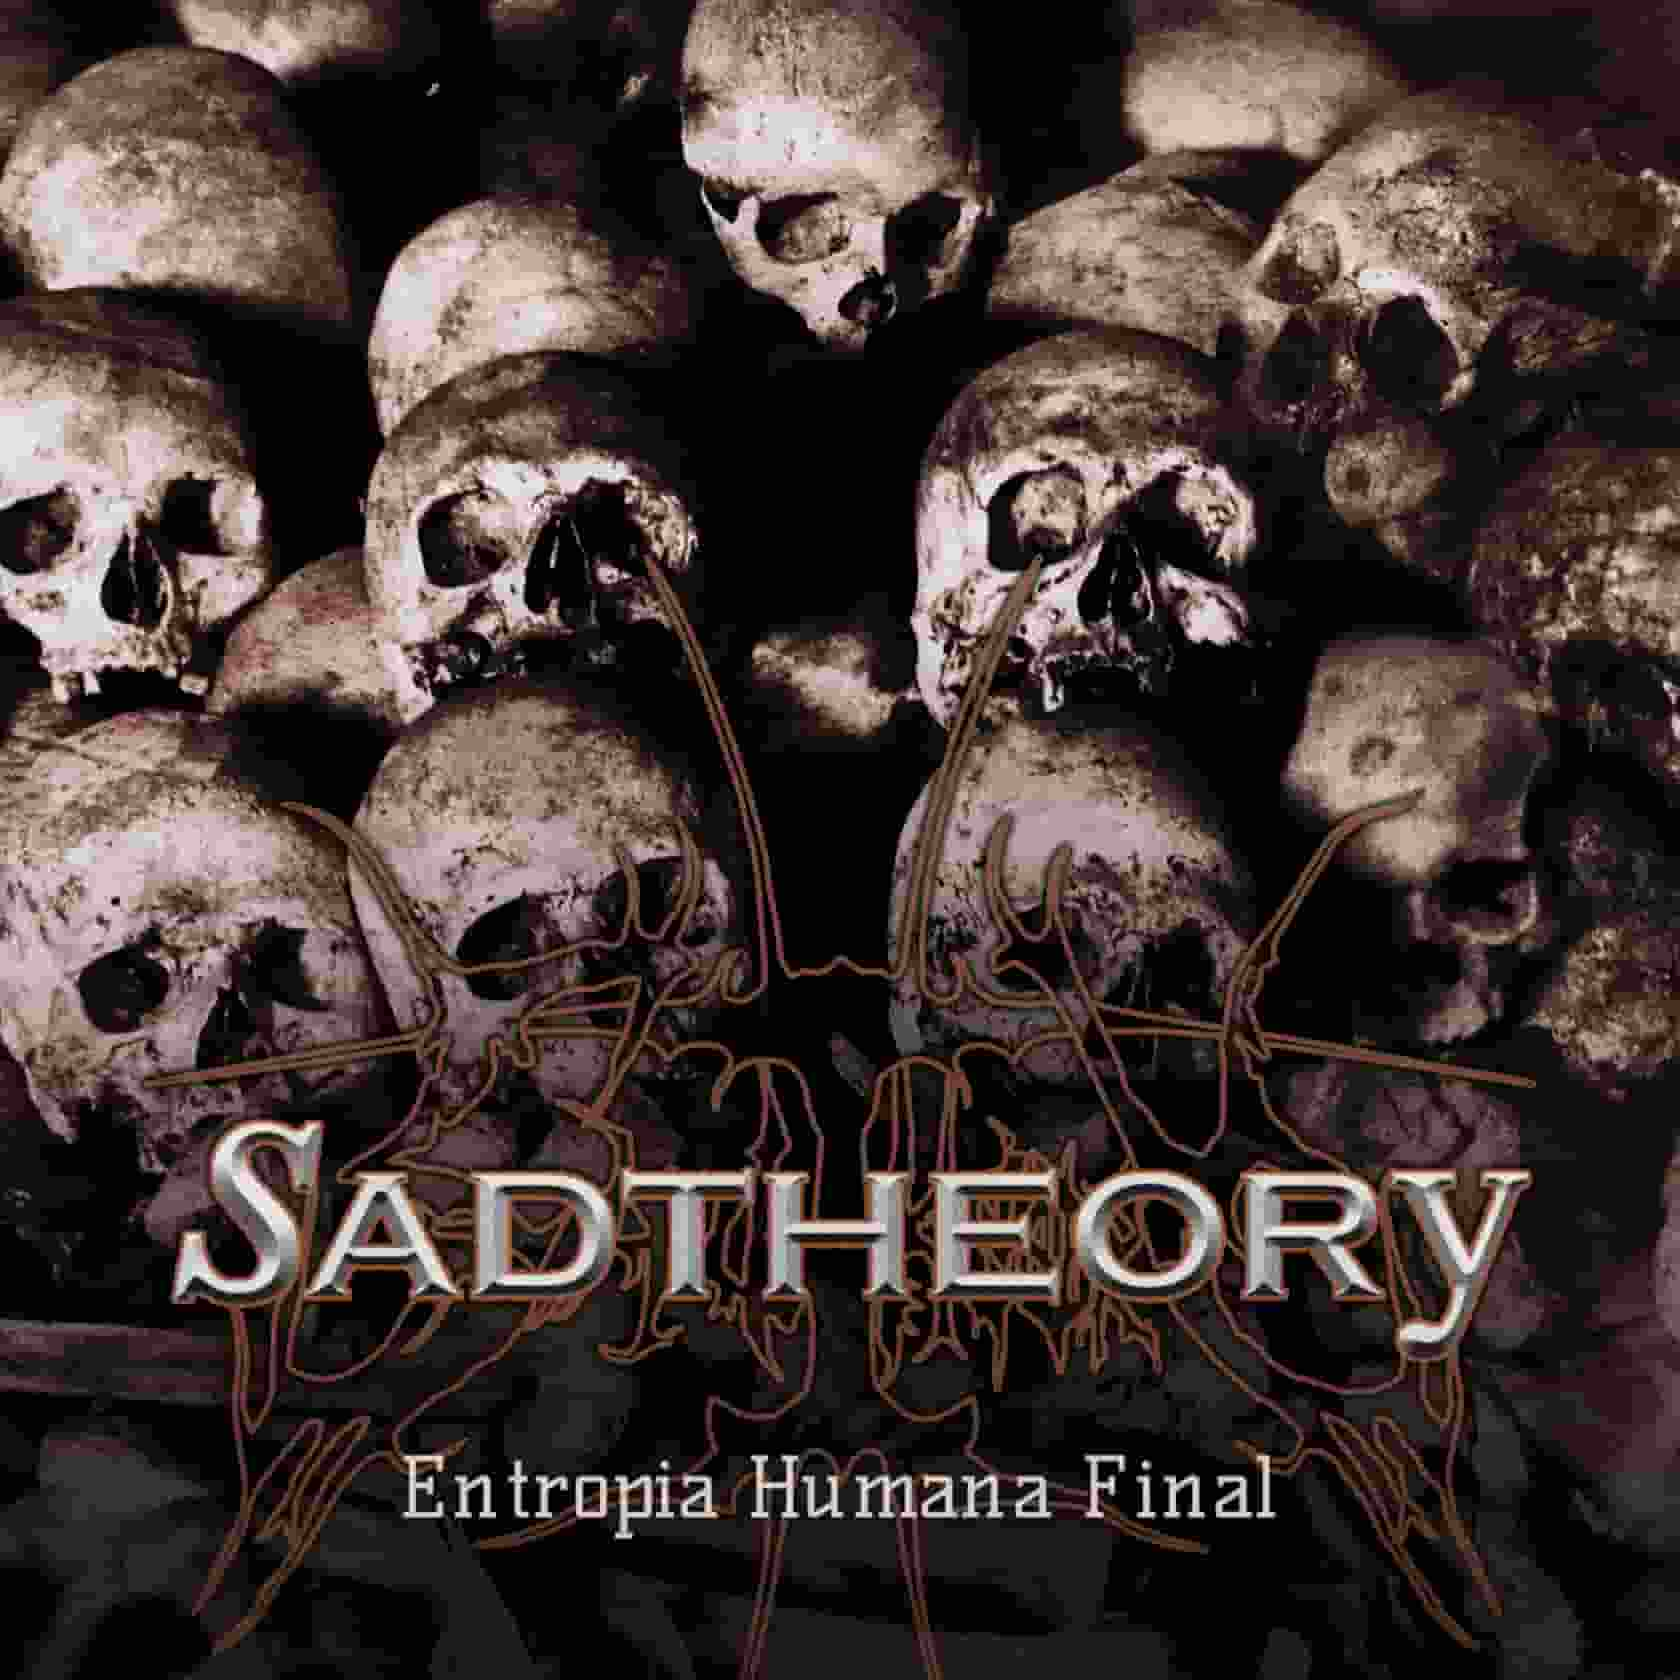 Sad Theory - Entropia Humana Final